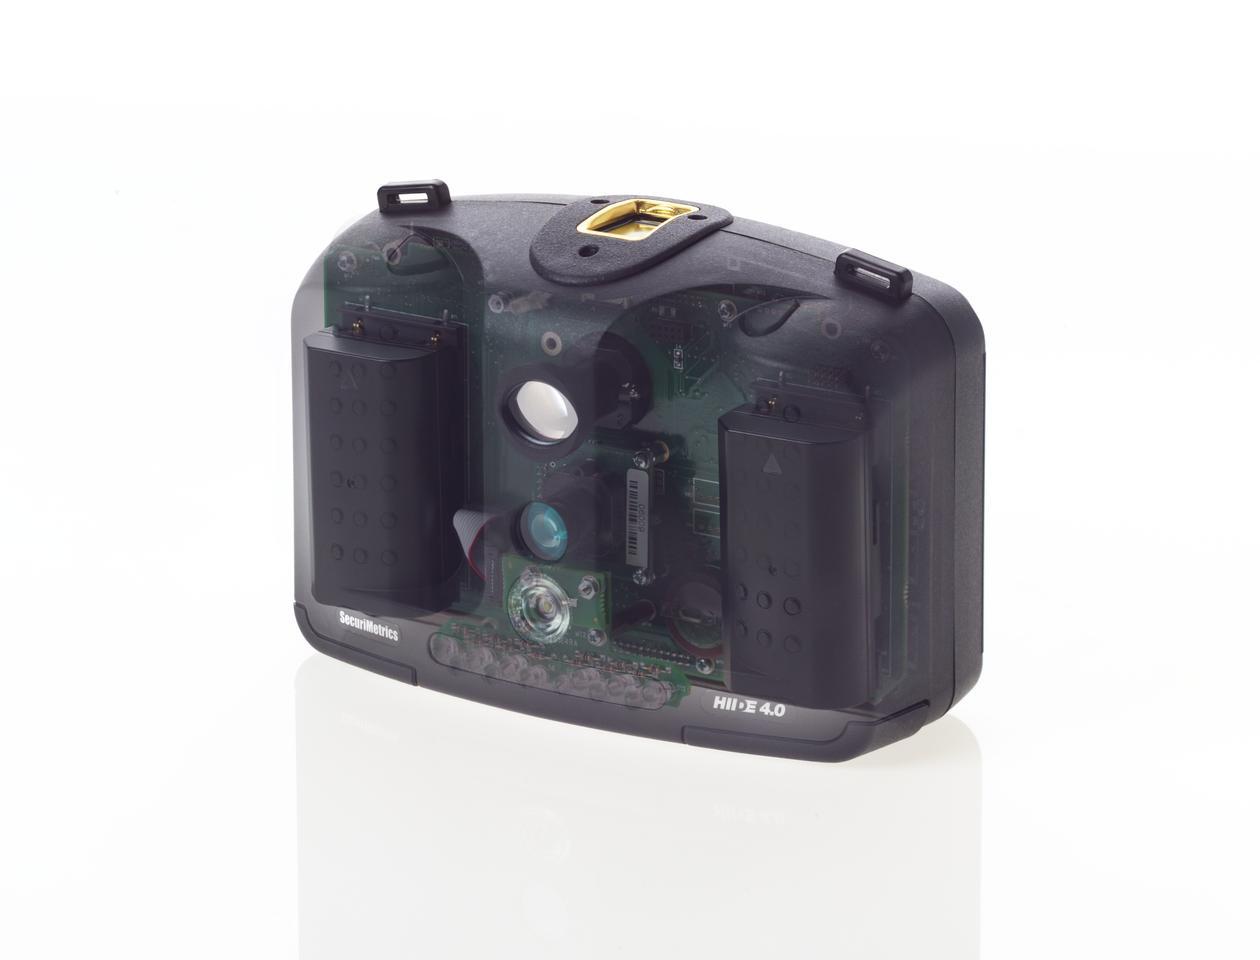 The HIIDE portable biometric device